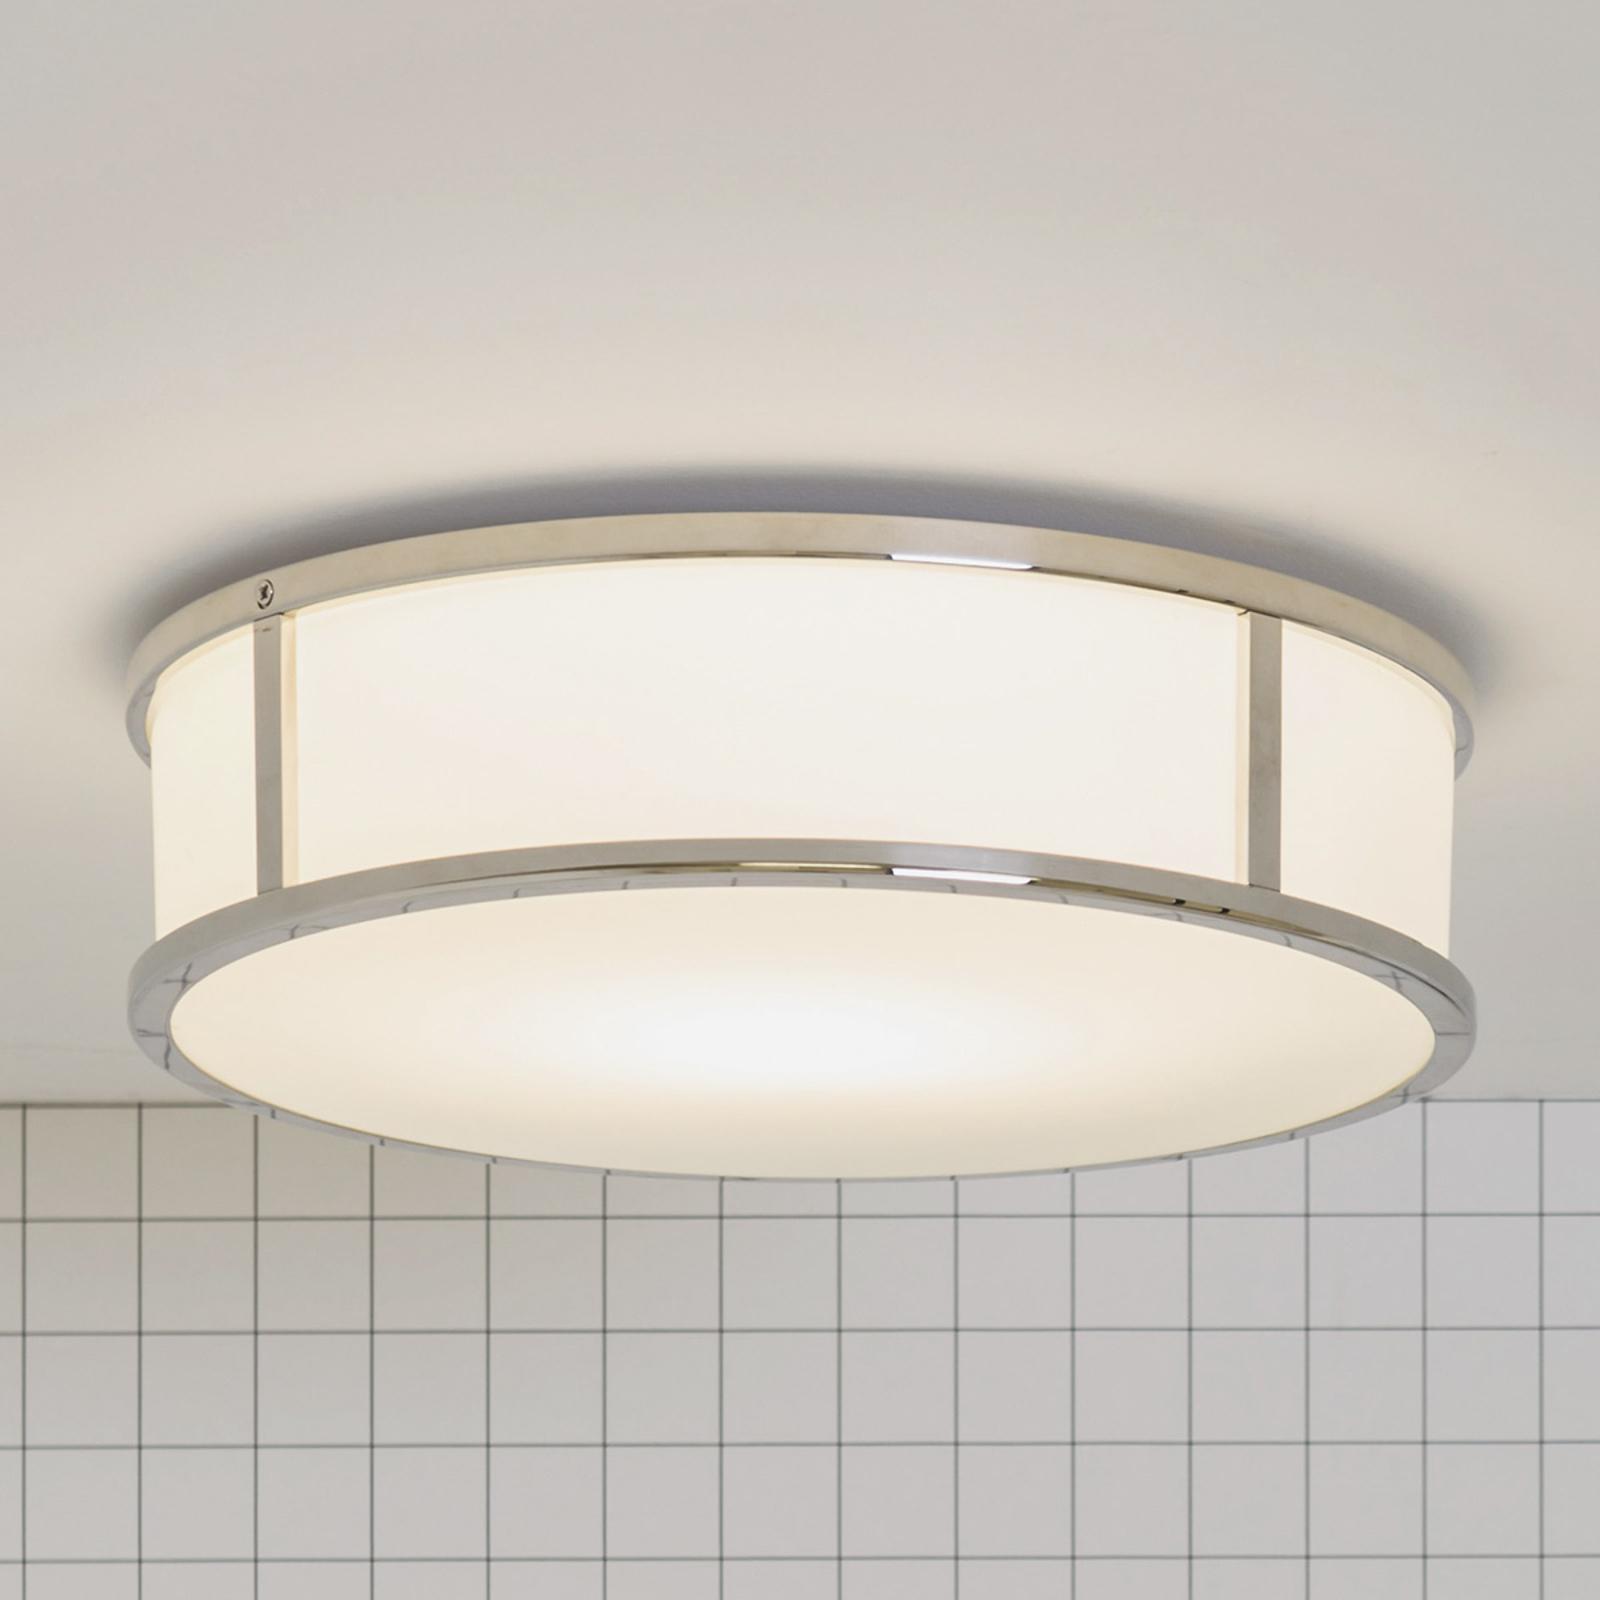 Astro Mashiko Round – lampa sufitowa Ø 30cm chrom